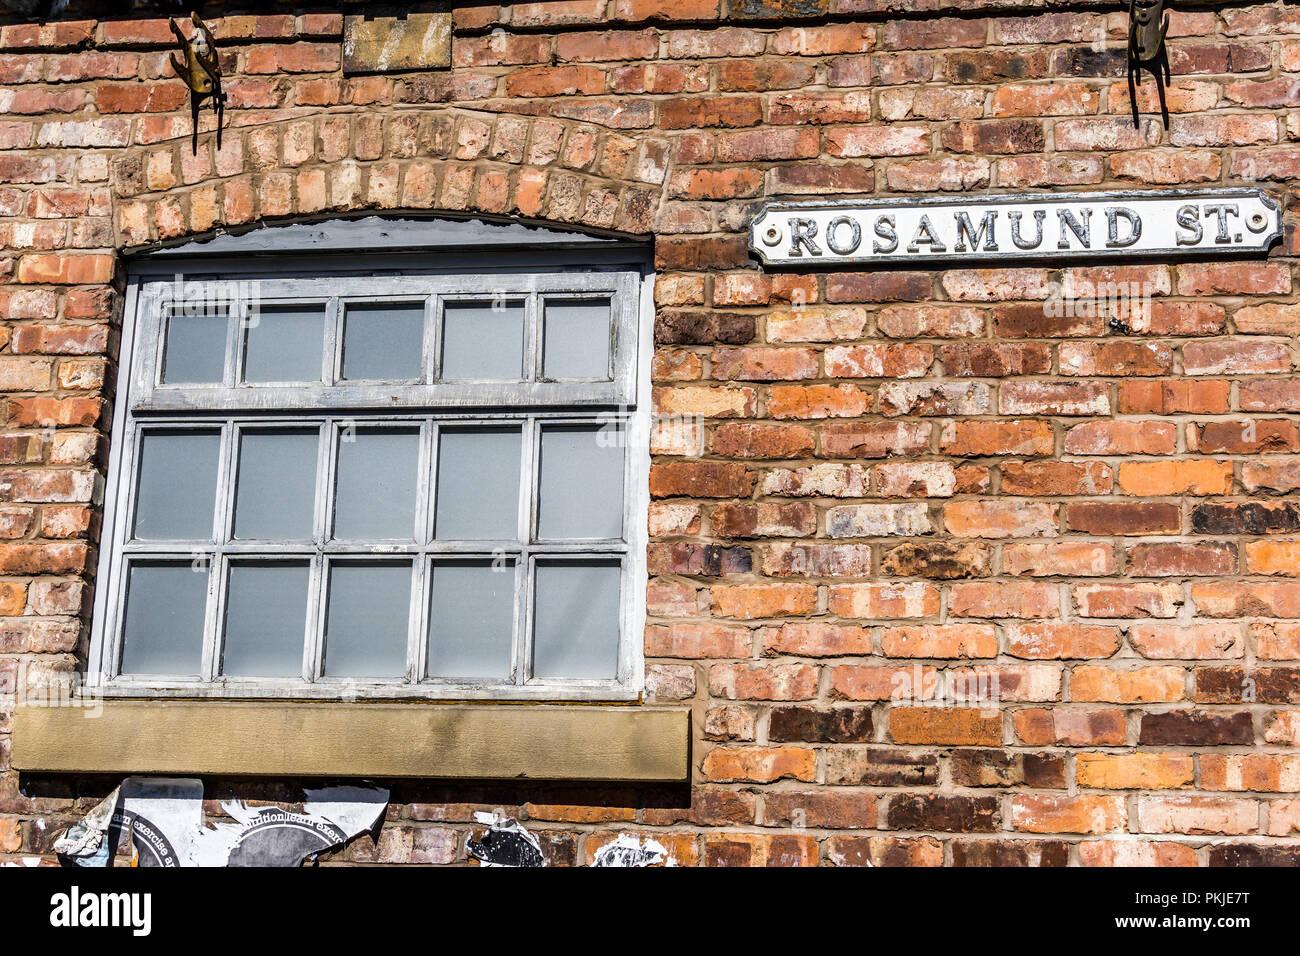 Rosamund Street, Coronation Street, The Studios from dock10, MediaCity UK, Salford M50 2EQ Stock Photo